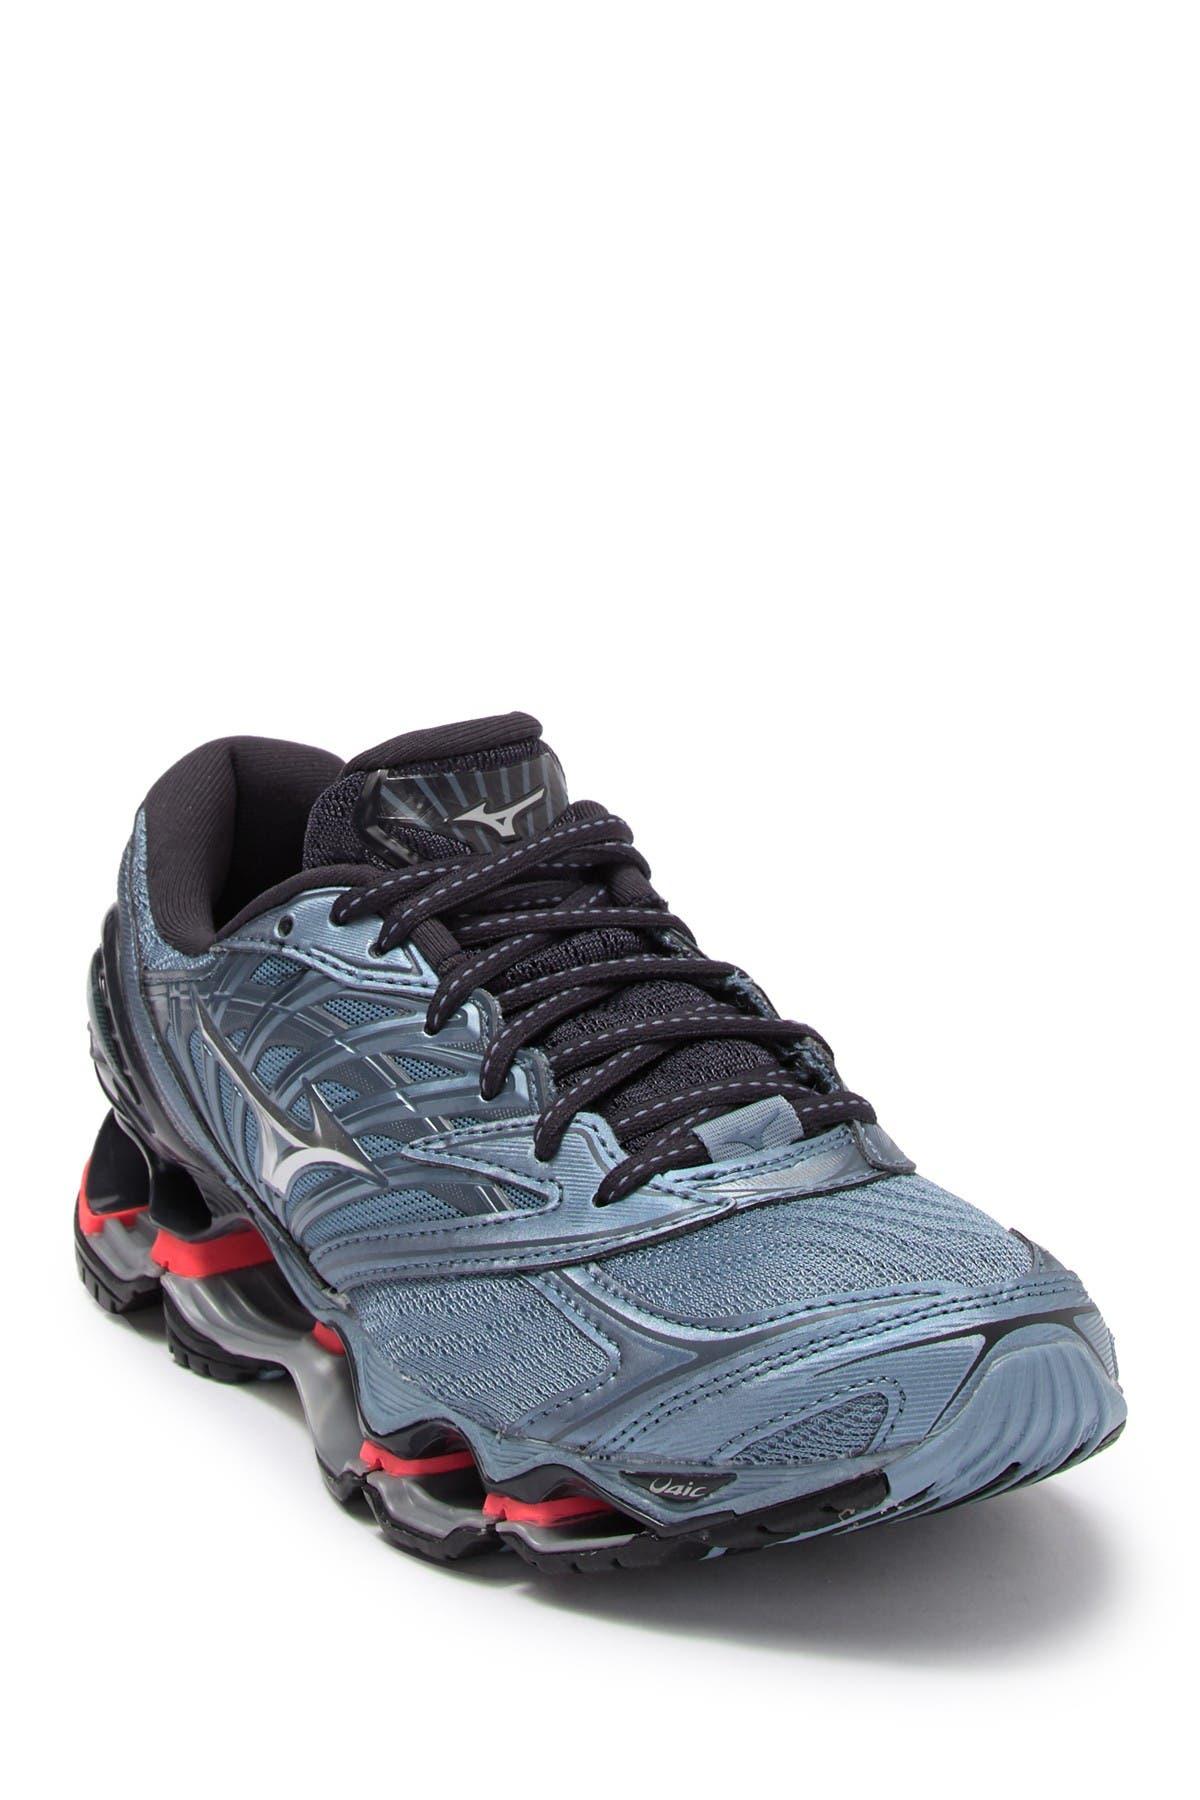 Image of Mizuno Wave Prophecy 8 Running Sneaker